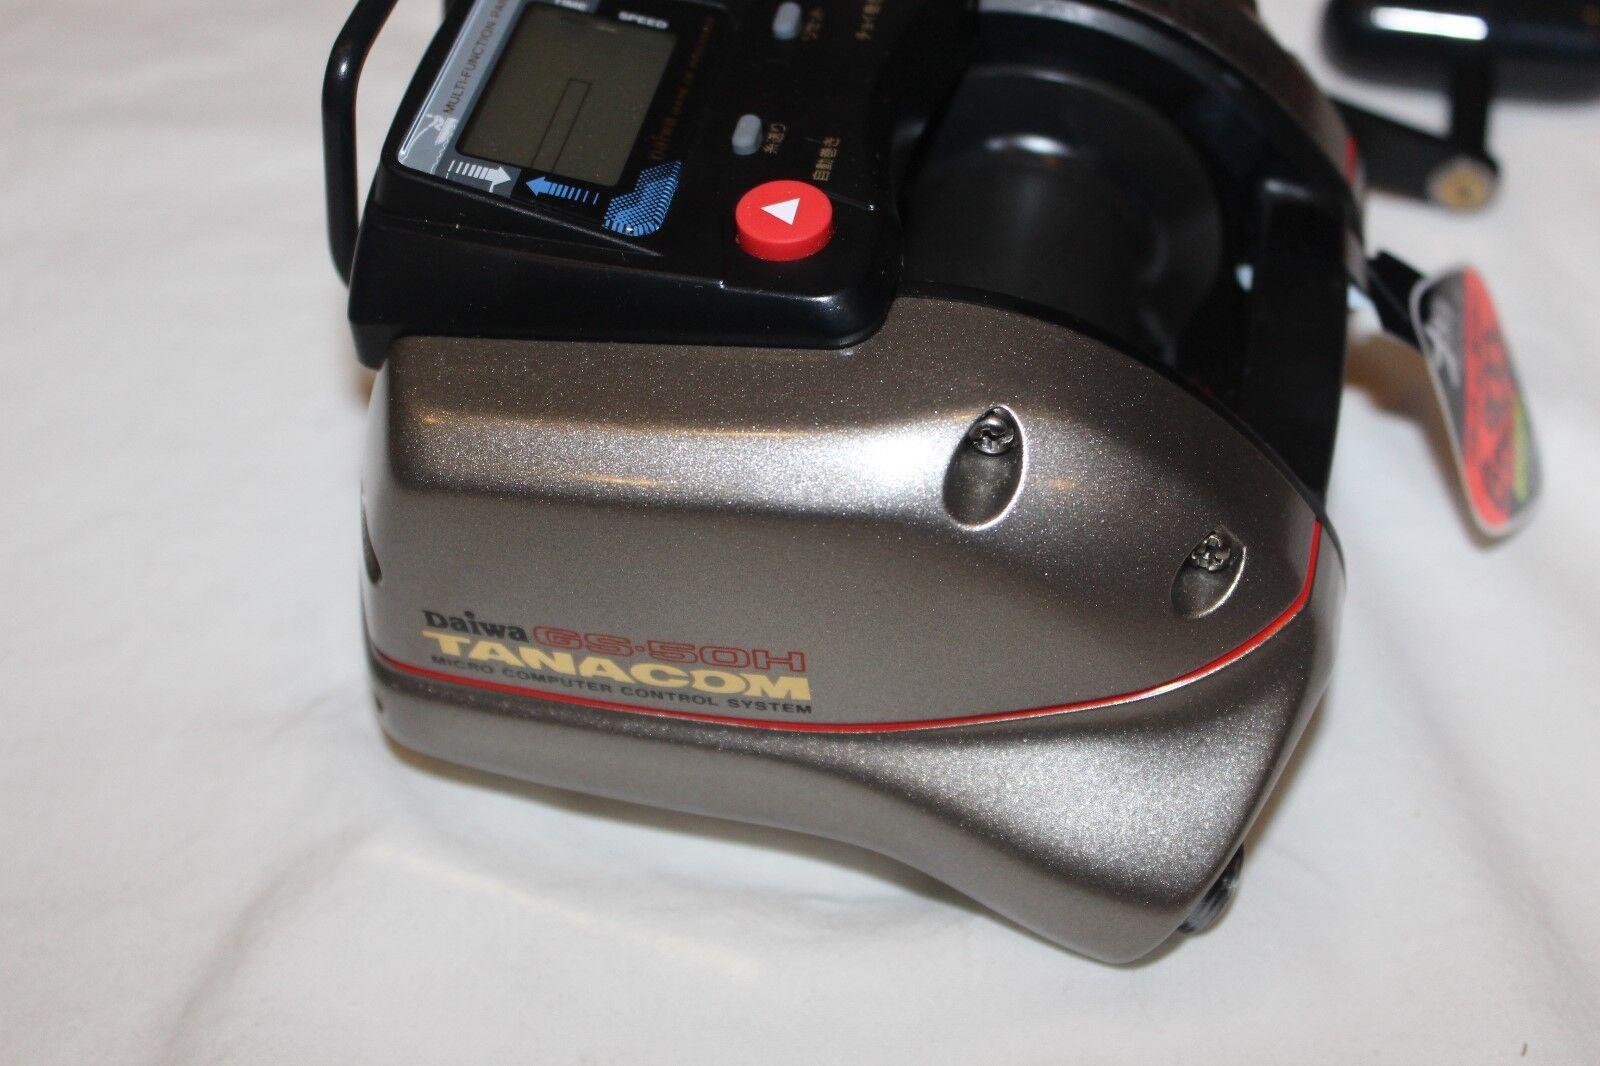 DAIWA TANACOM GS-50-H-ELEKTROROLLE-NEU IM IM GS-50-H-ELEKTROROLLE-NEU OVP-MADE IN JAPAN-Nr 862 59147e